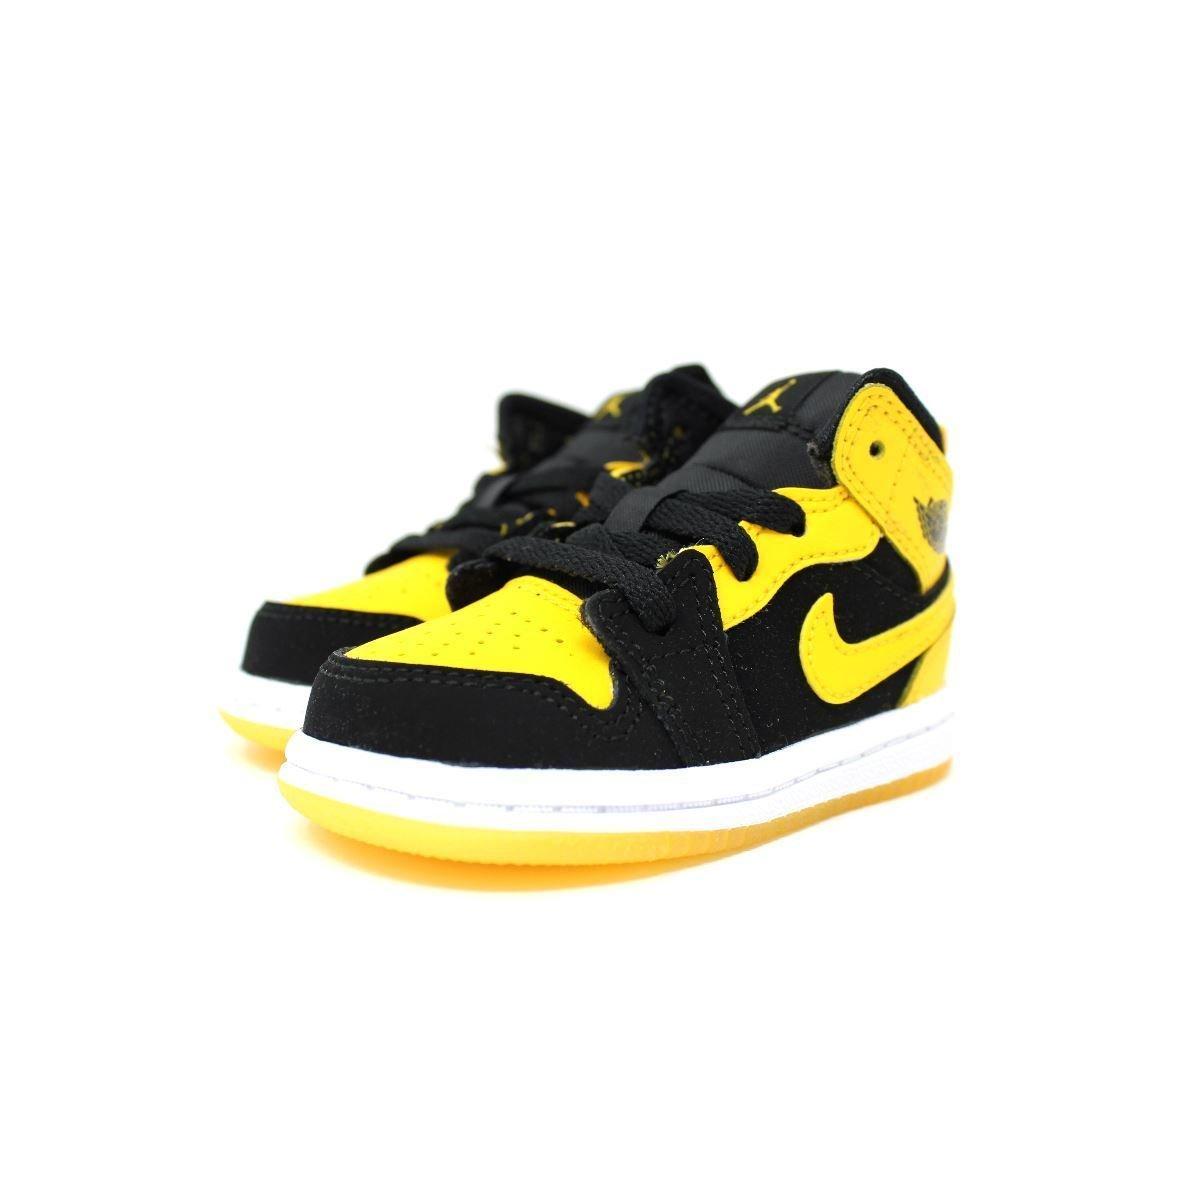 Nike Toddler Boy's Air Jordan 1 (Mid) Basketball Shoes Black/Varsity Maize-White 10C